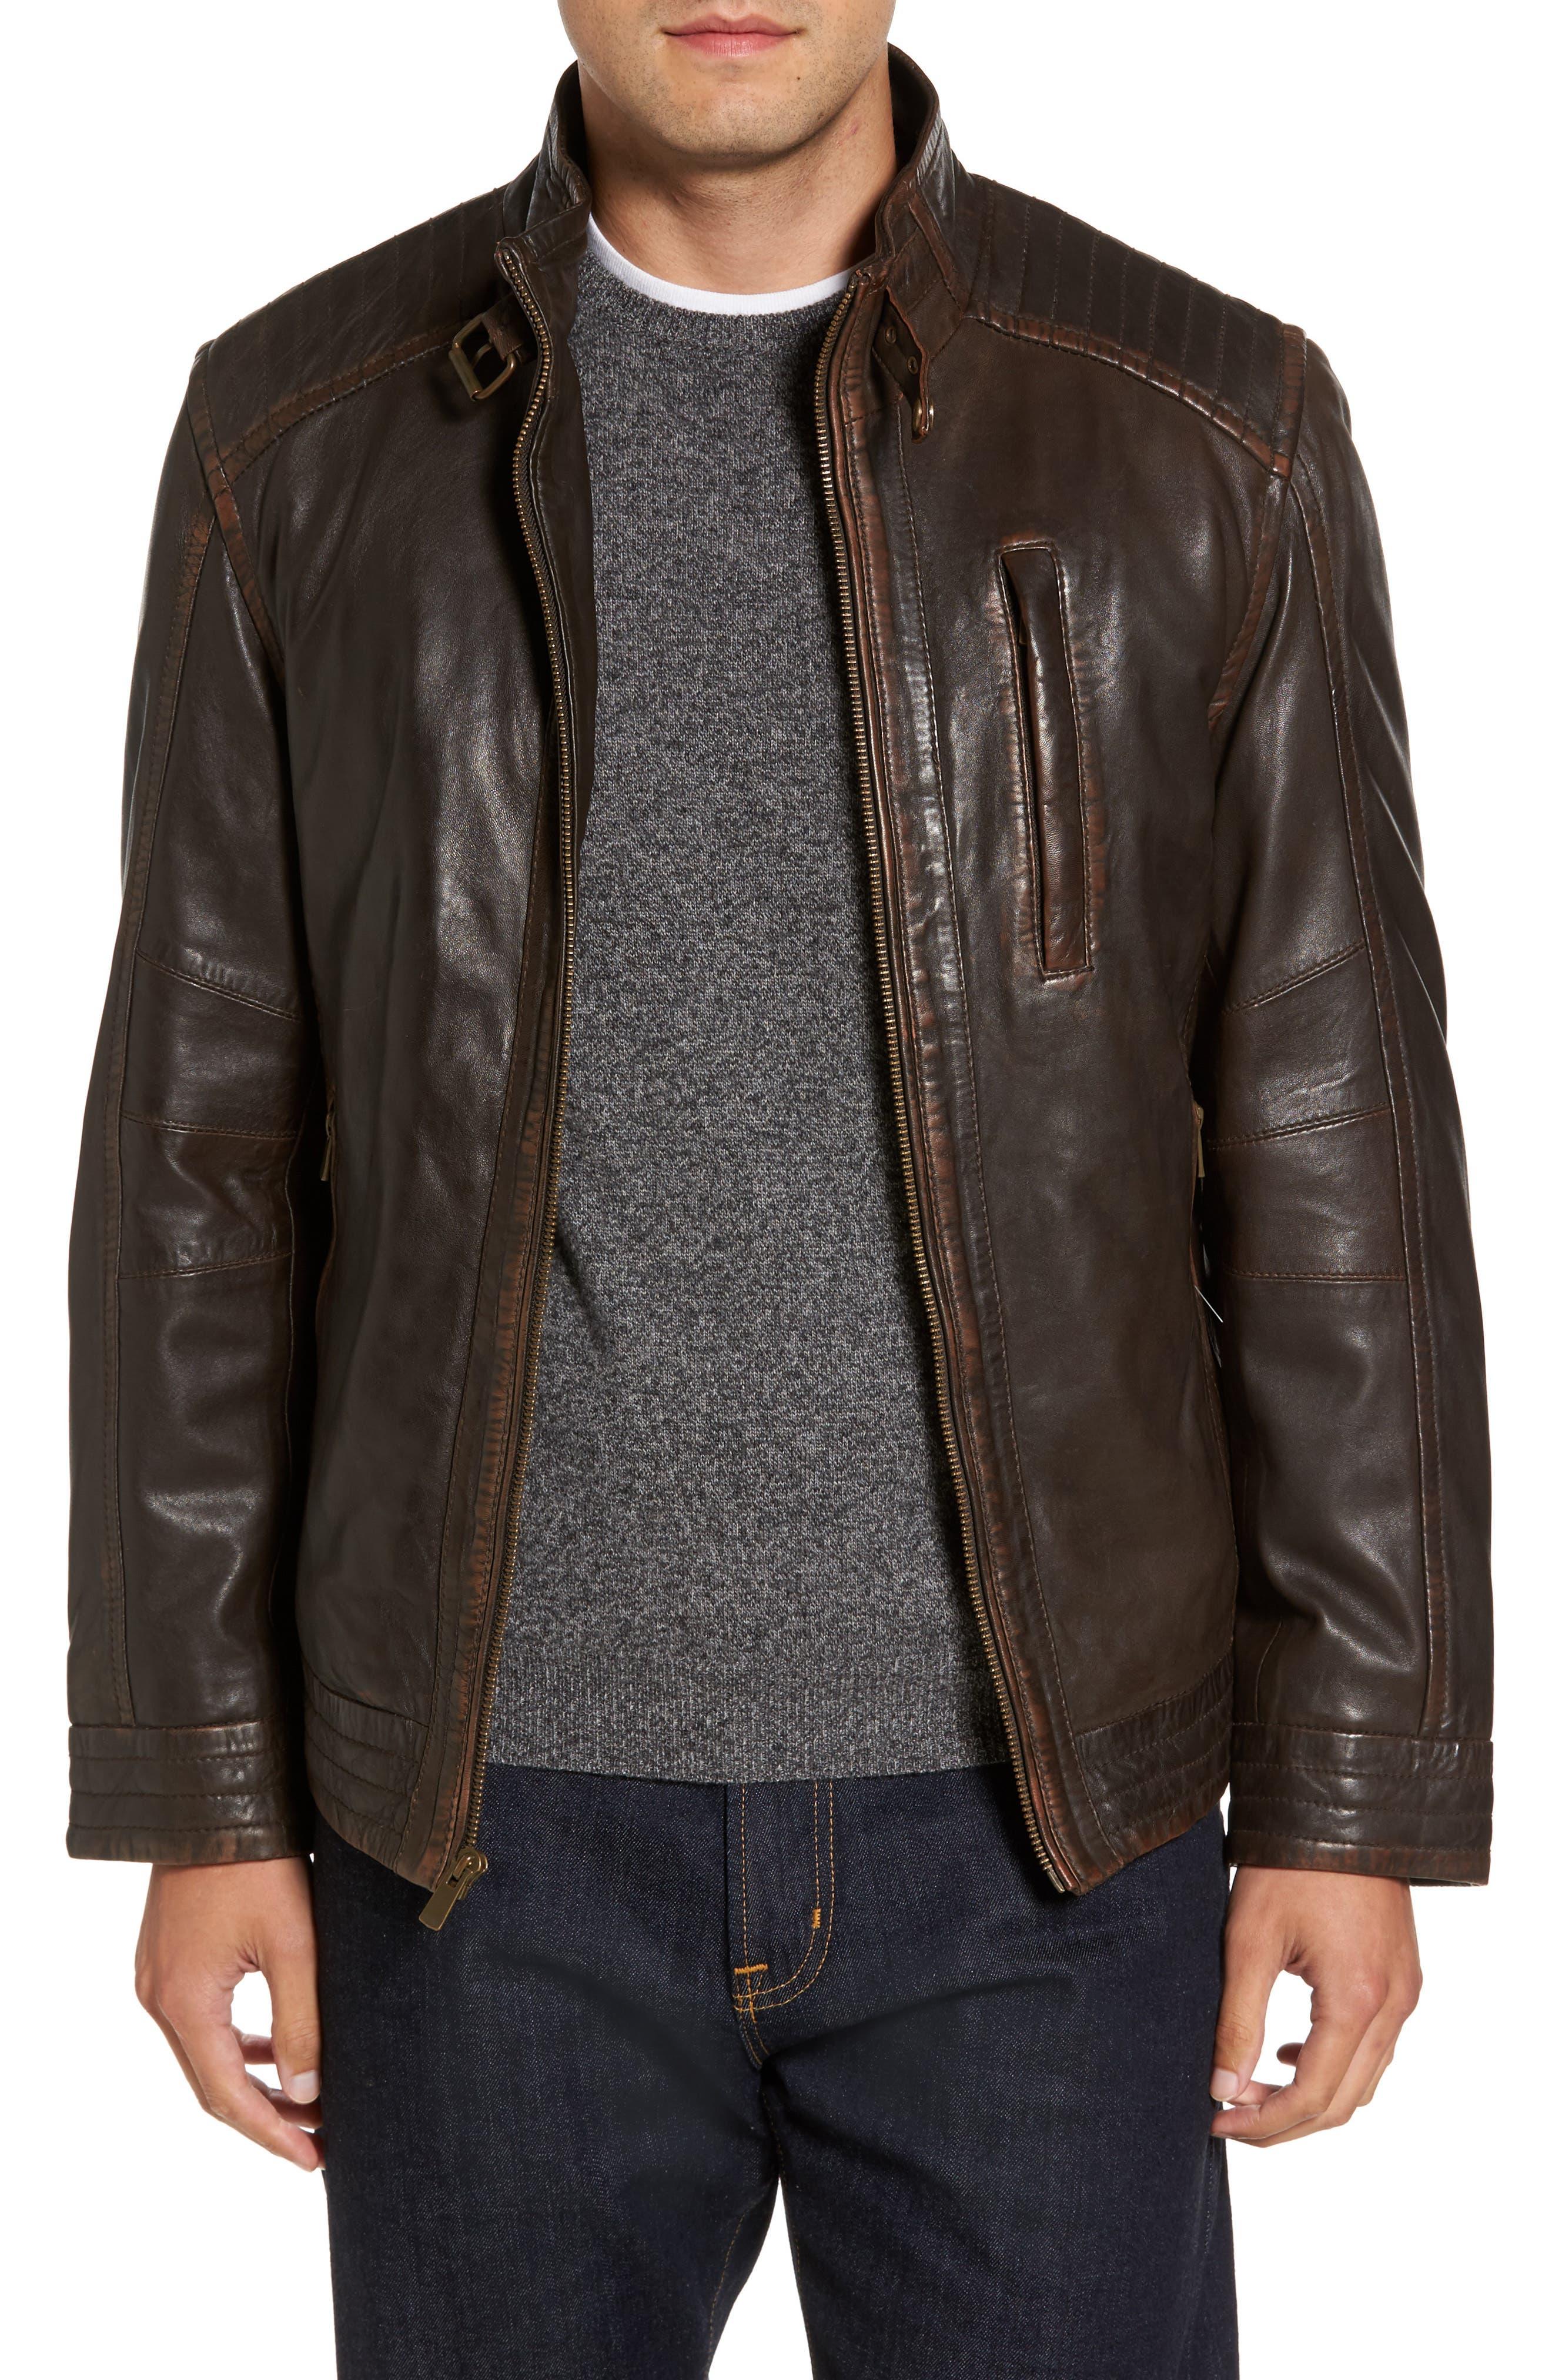 Alternate Image 1 Selected - Missani Le Collezioni Leather Jacket